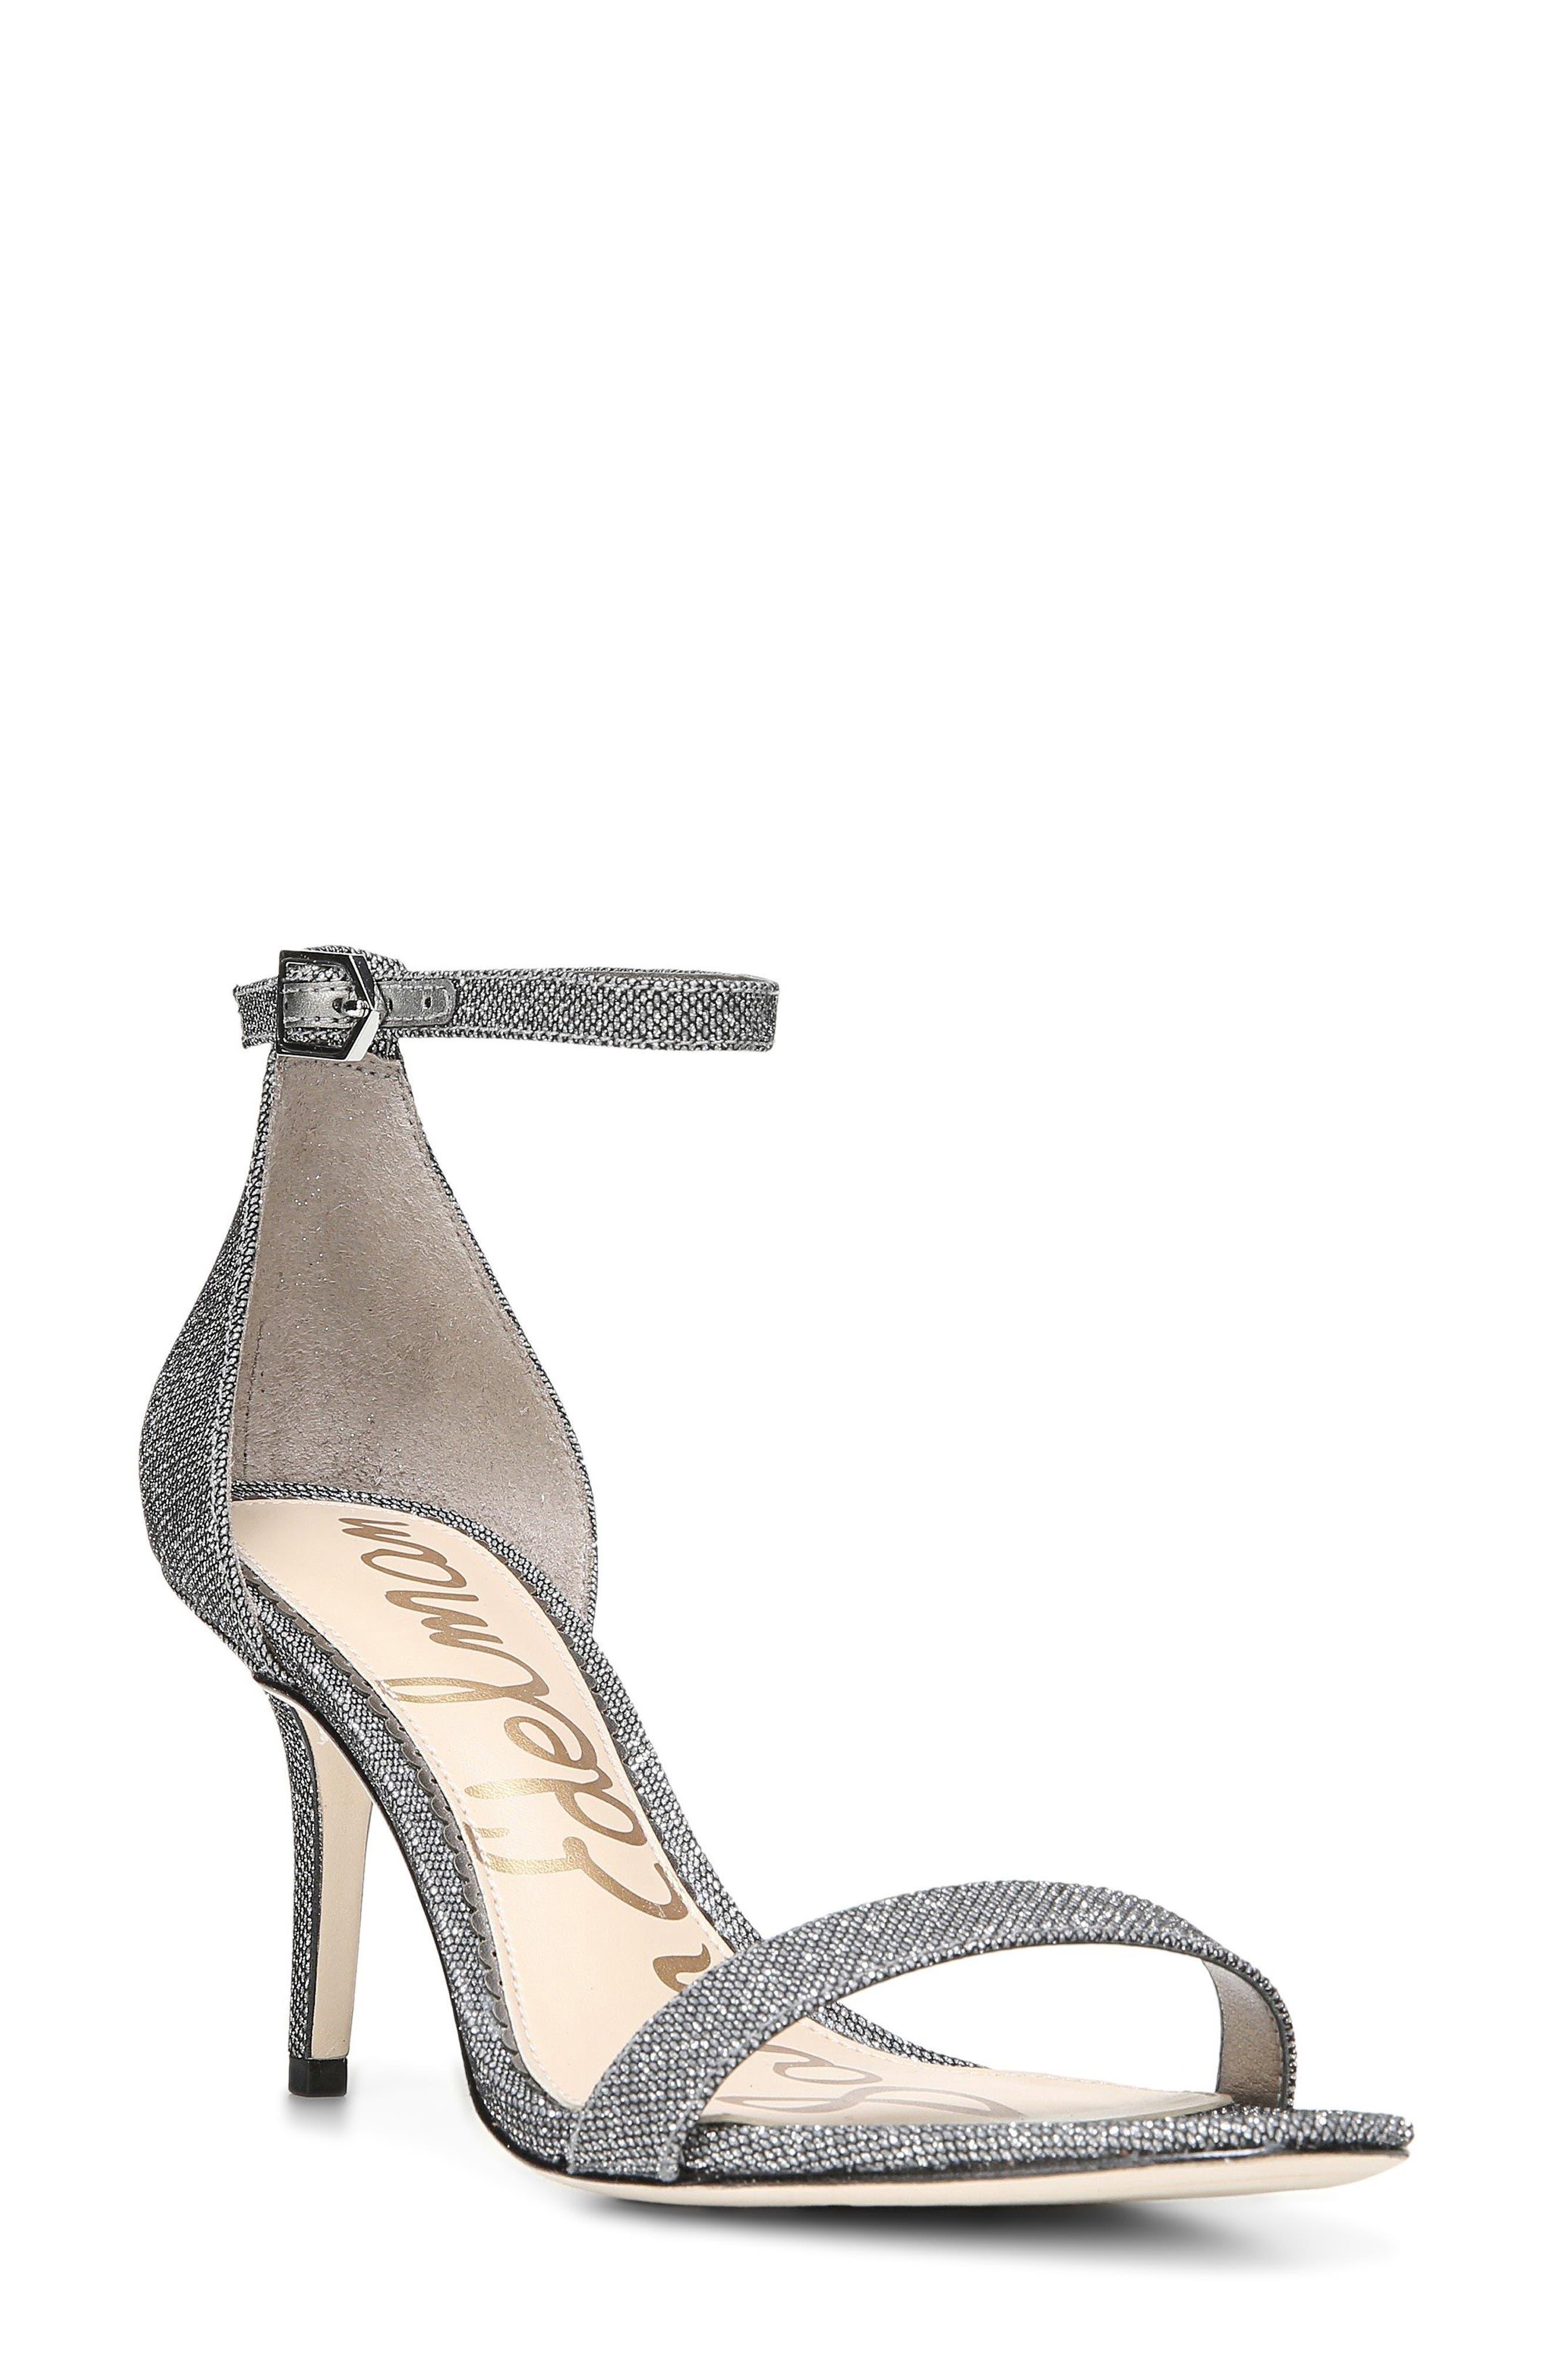 SAM EDELMAN Patti Ankle Strap Sandal, Main, color, PEWTER FABRIC